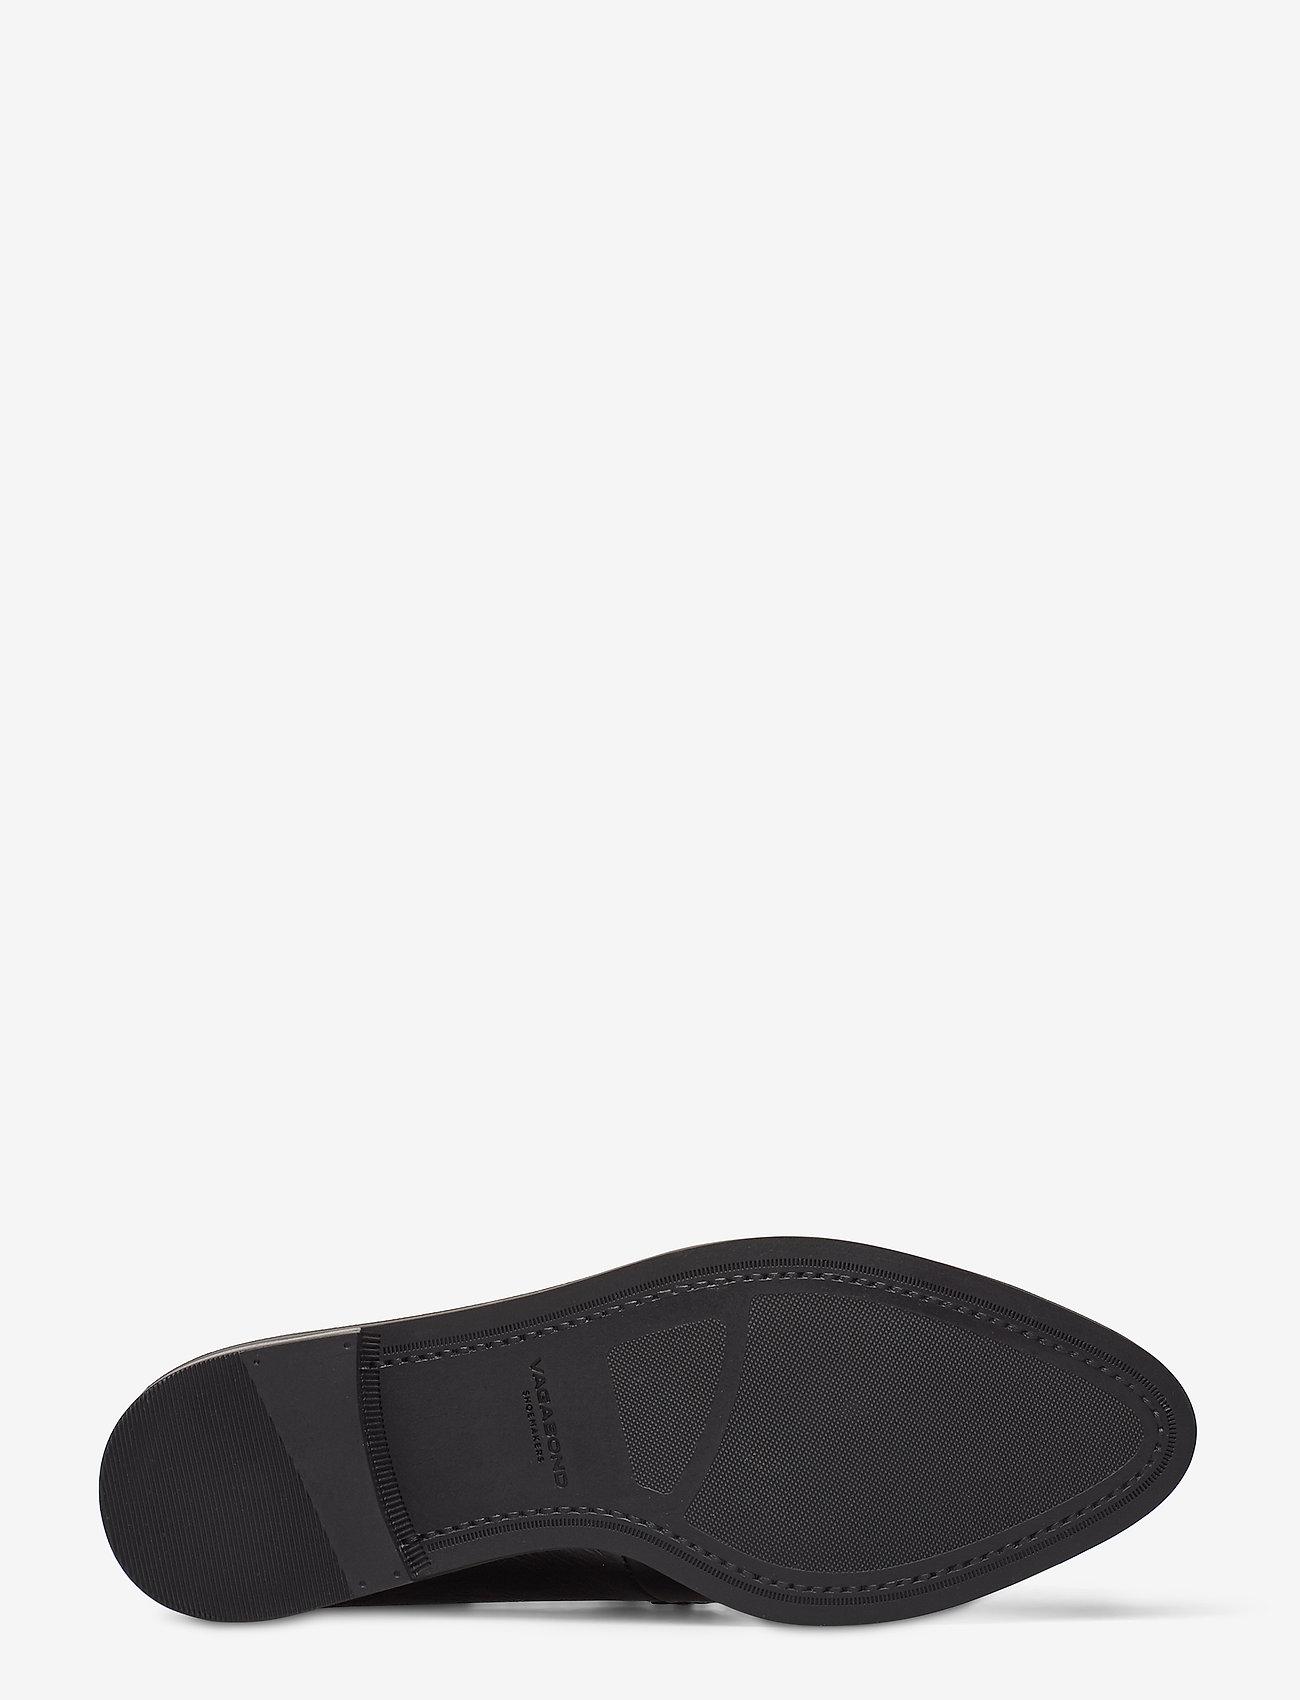 Frances (Black) (69.97 €) - VAGABOND P7s1v